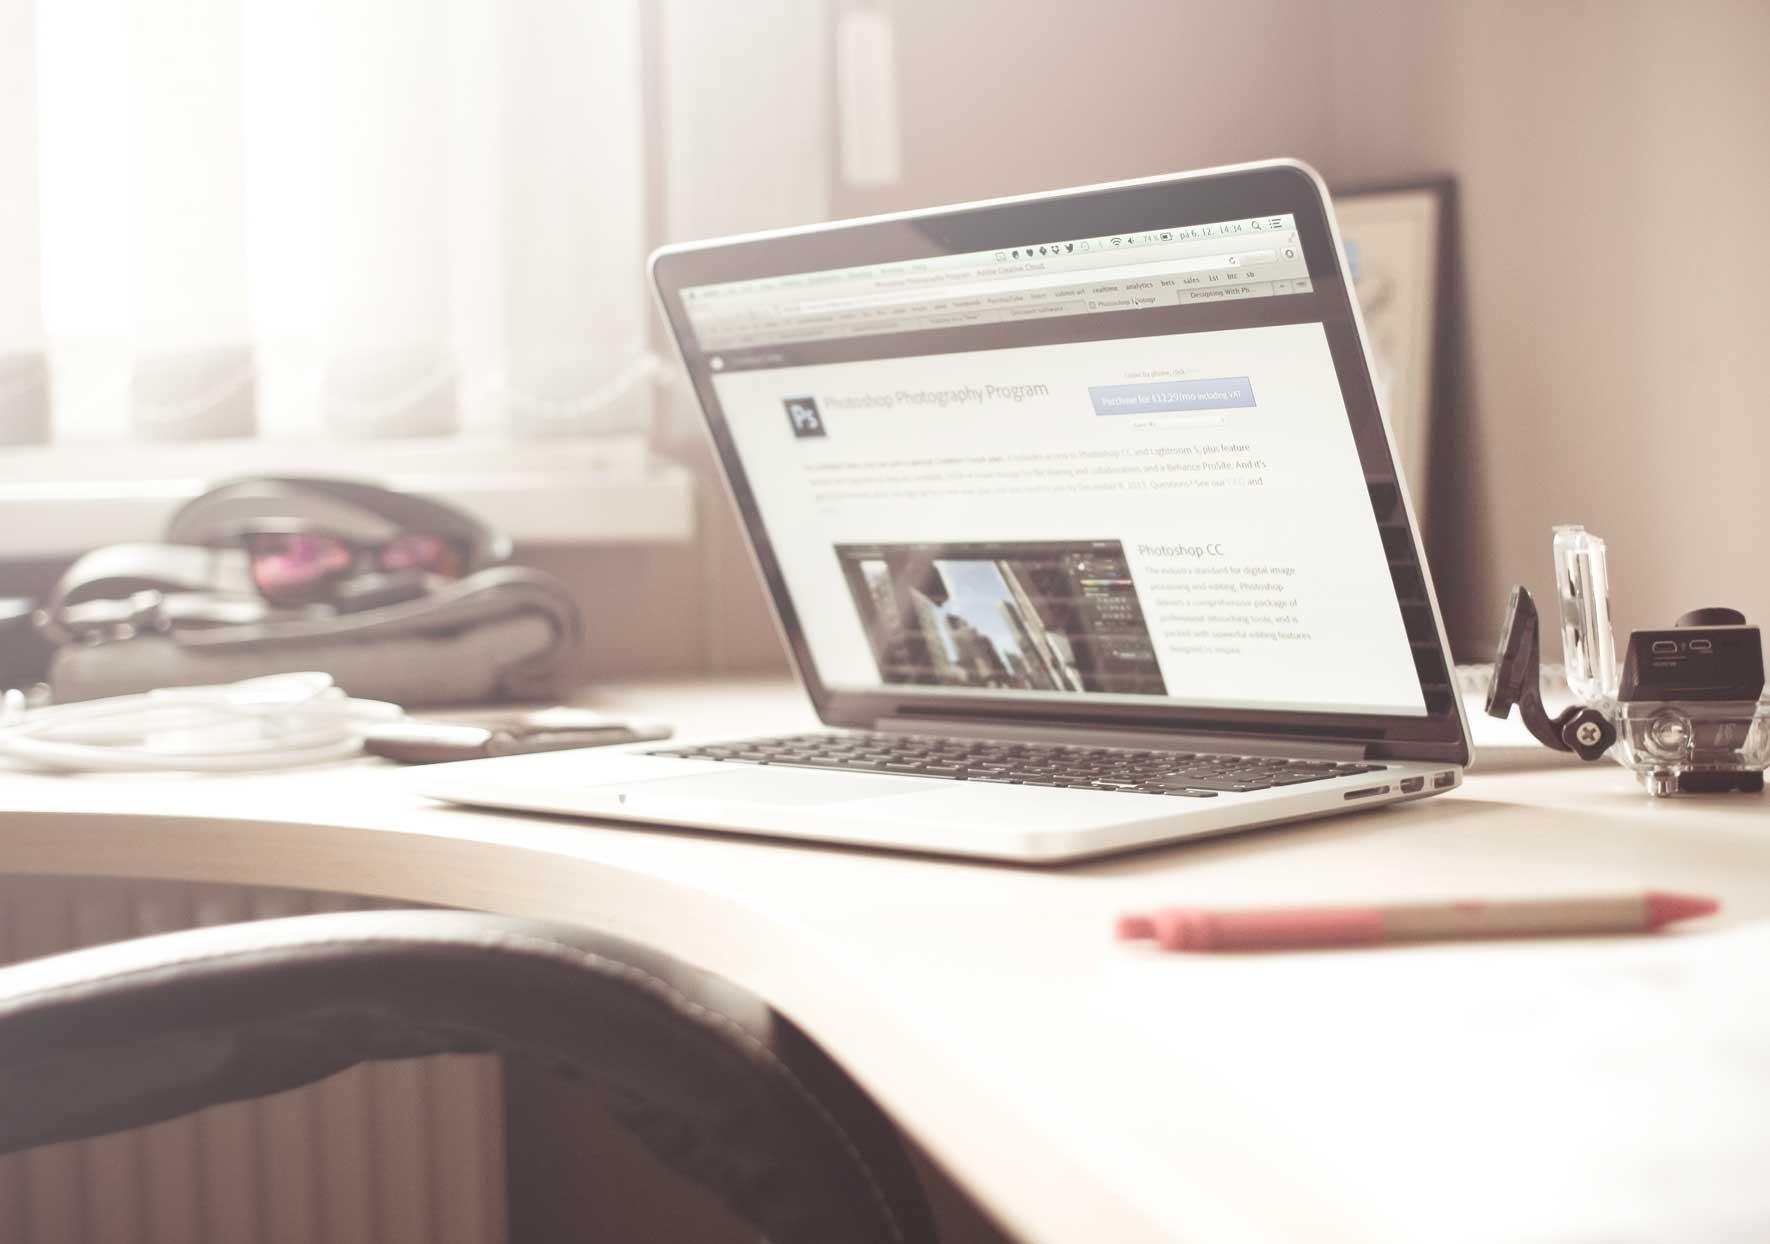 Essential factors that create an effective e-commerce site